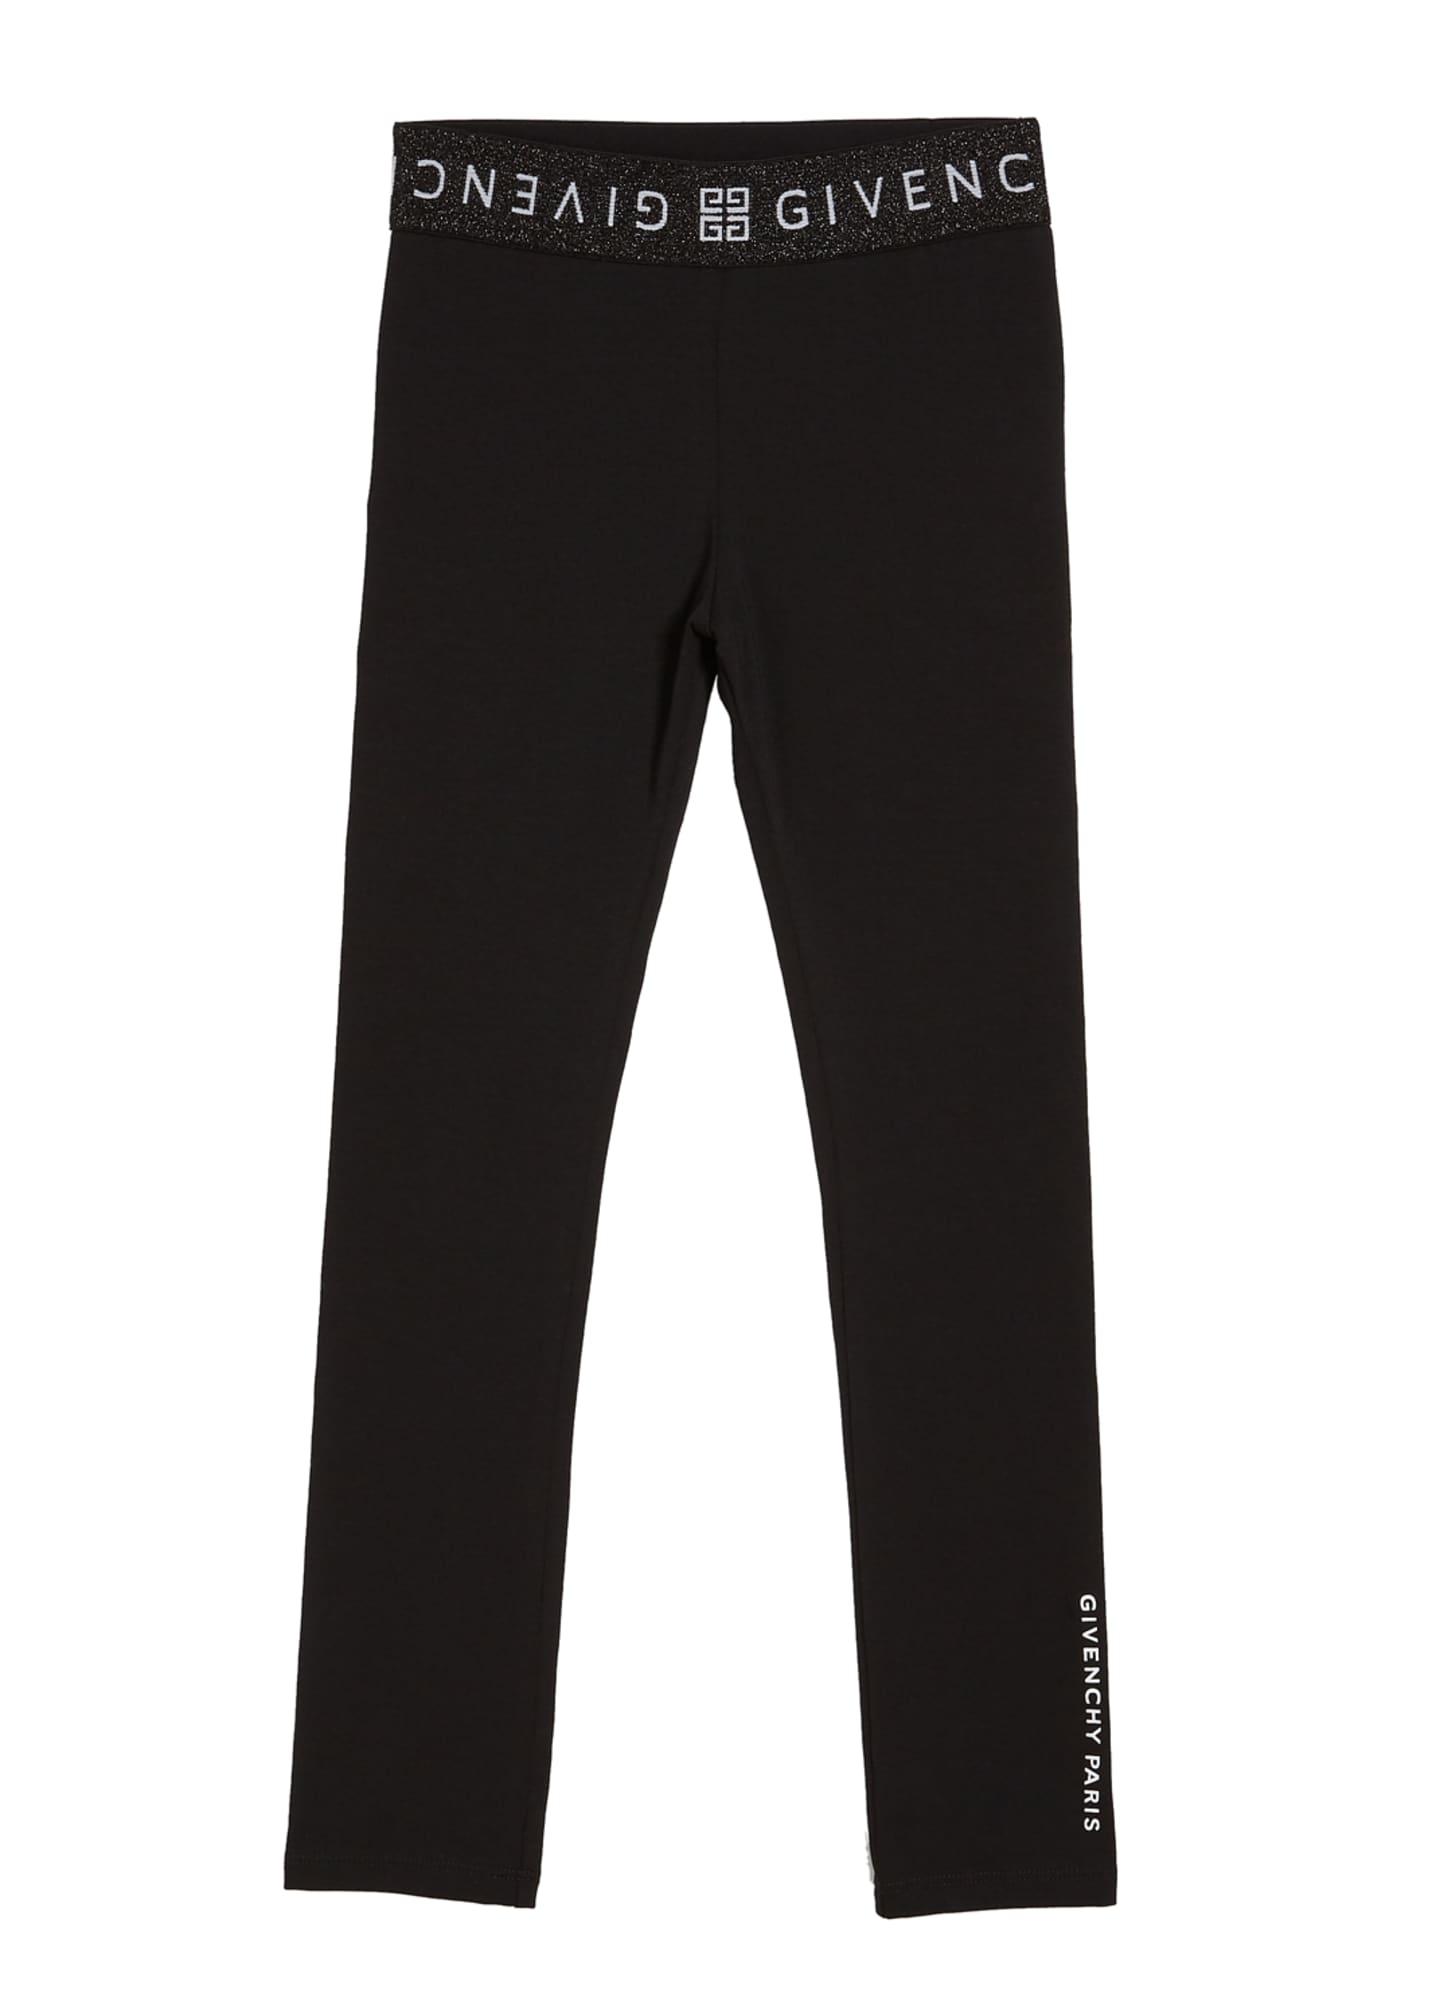 Givenchy Girl's Logo Trim Lounge Pants, Size 12-14